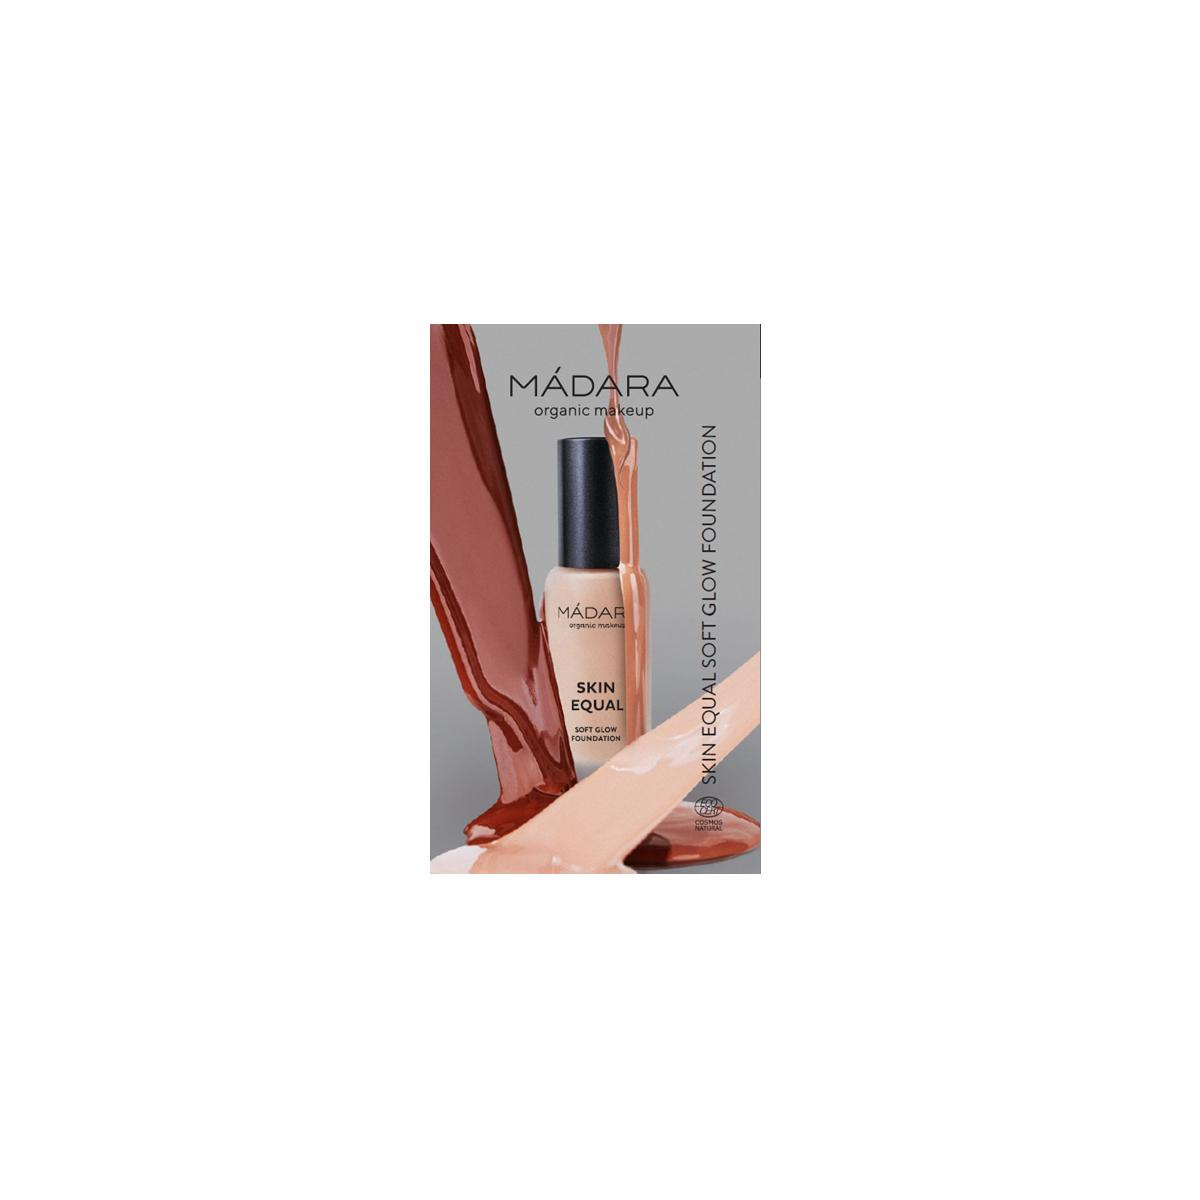 MÁDARA Make-up s SPF 15, Sand 40 2 ml